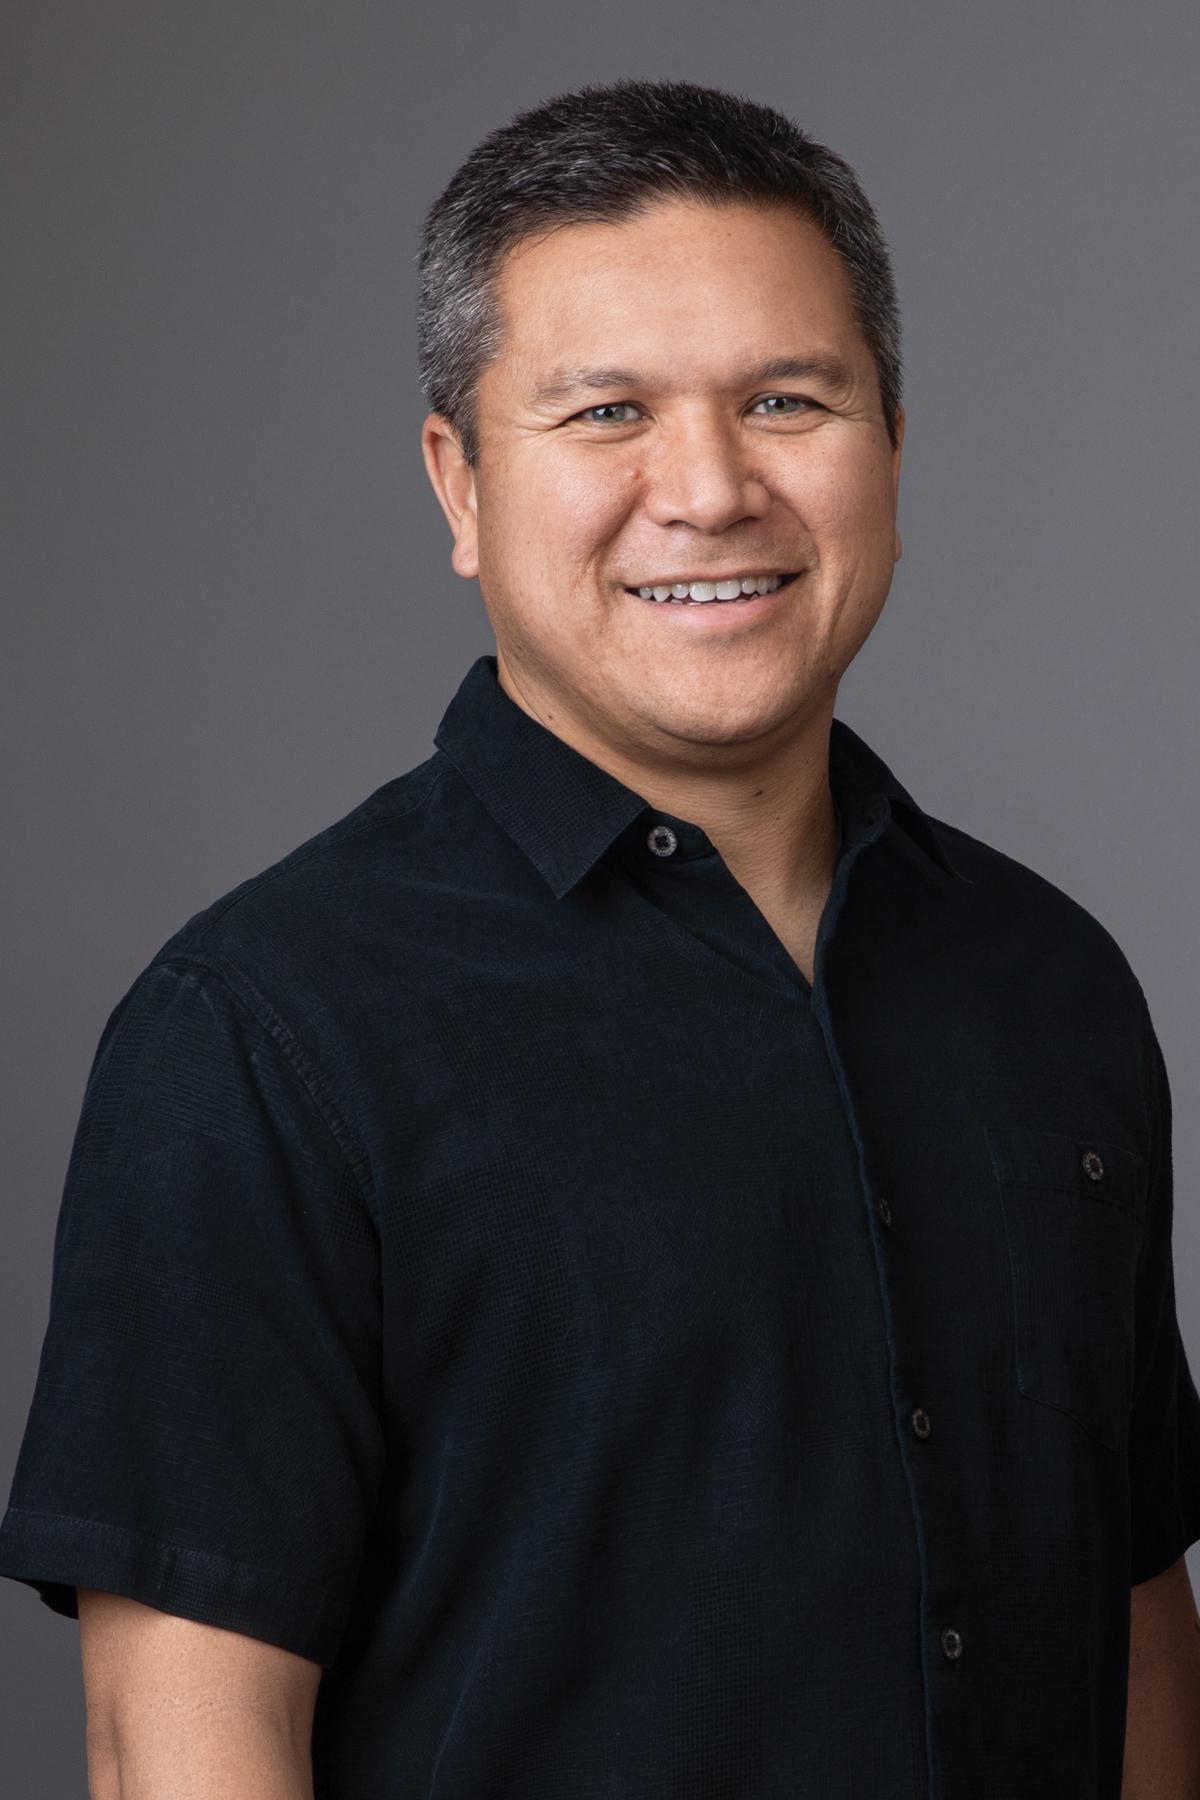 Derek N.Q. Takai, D.D.S.